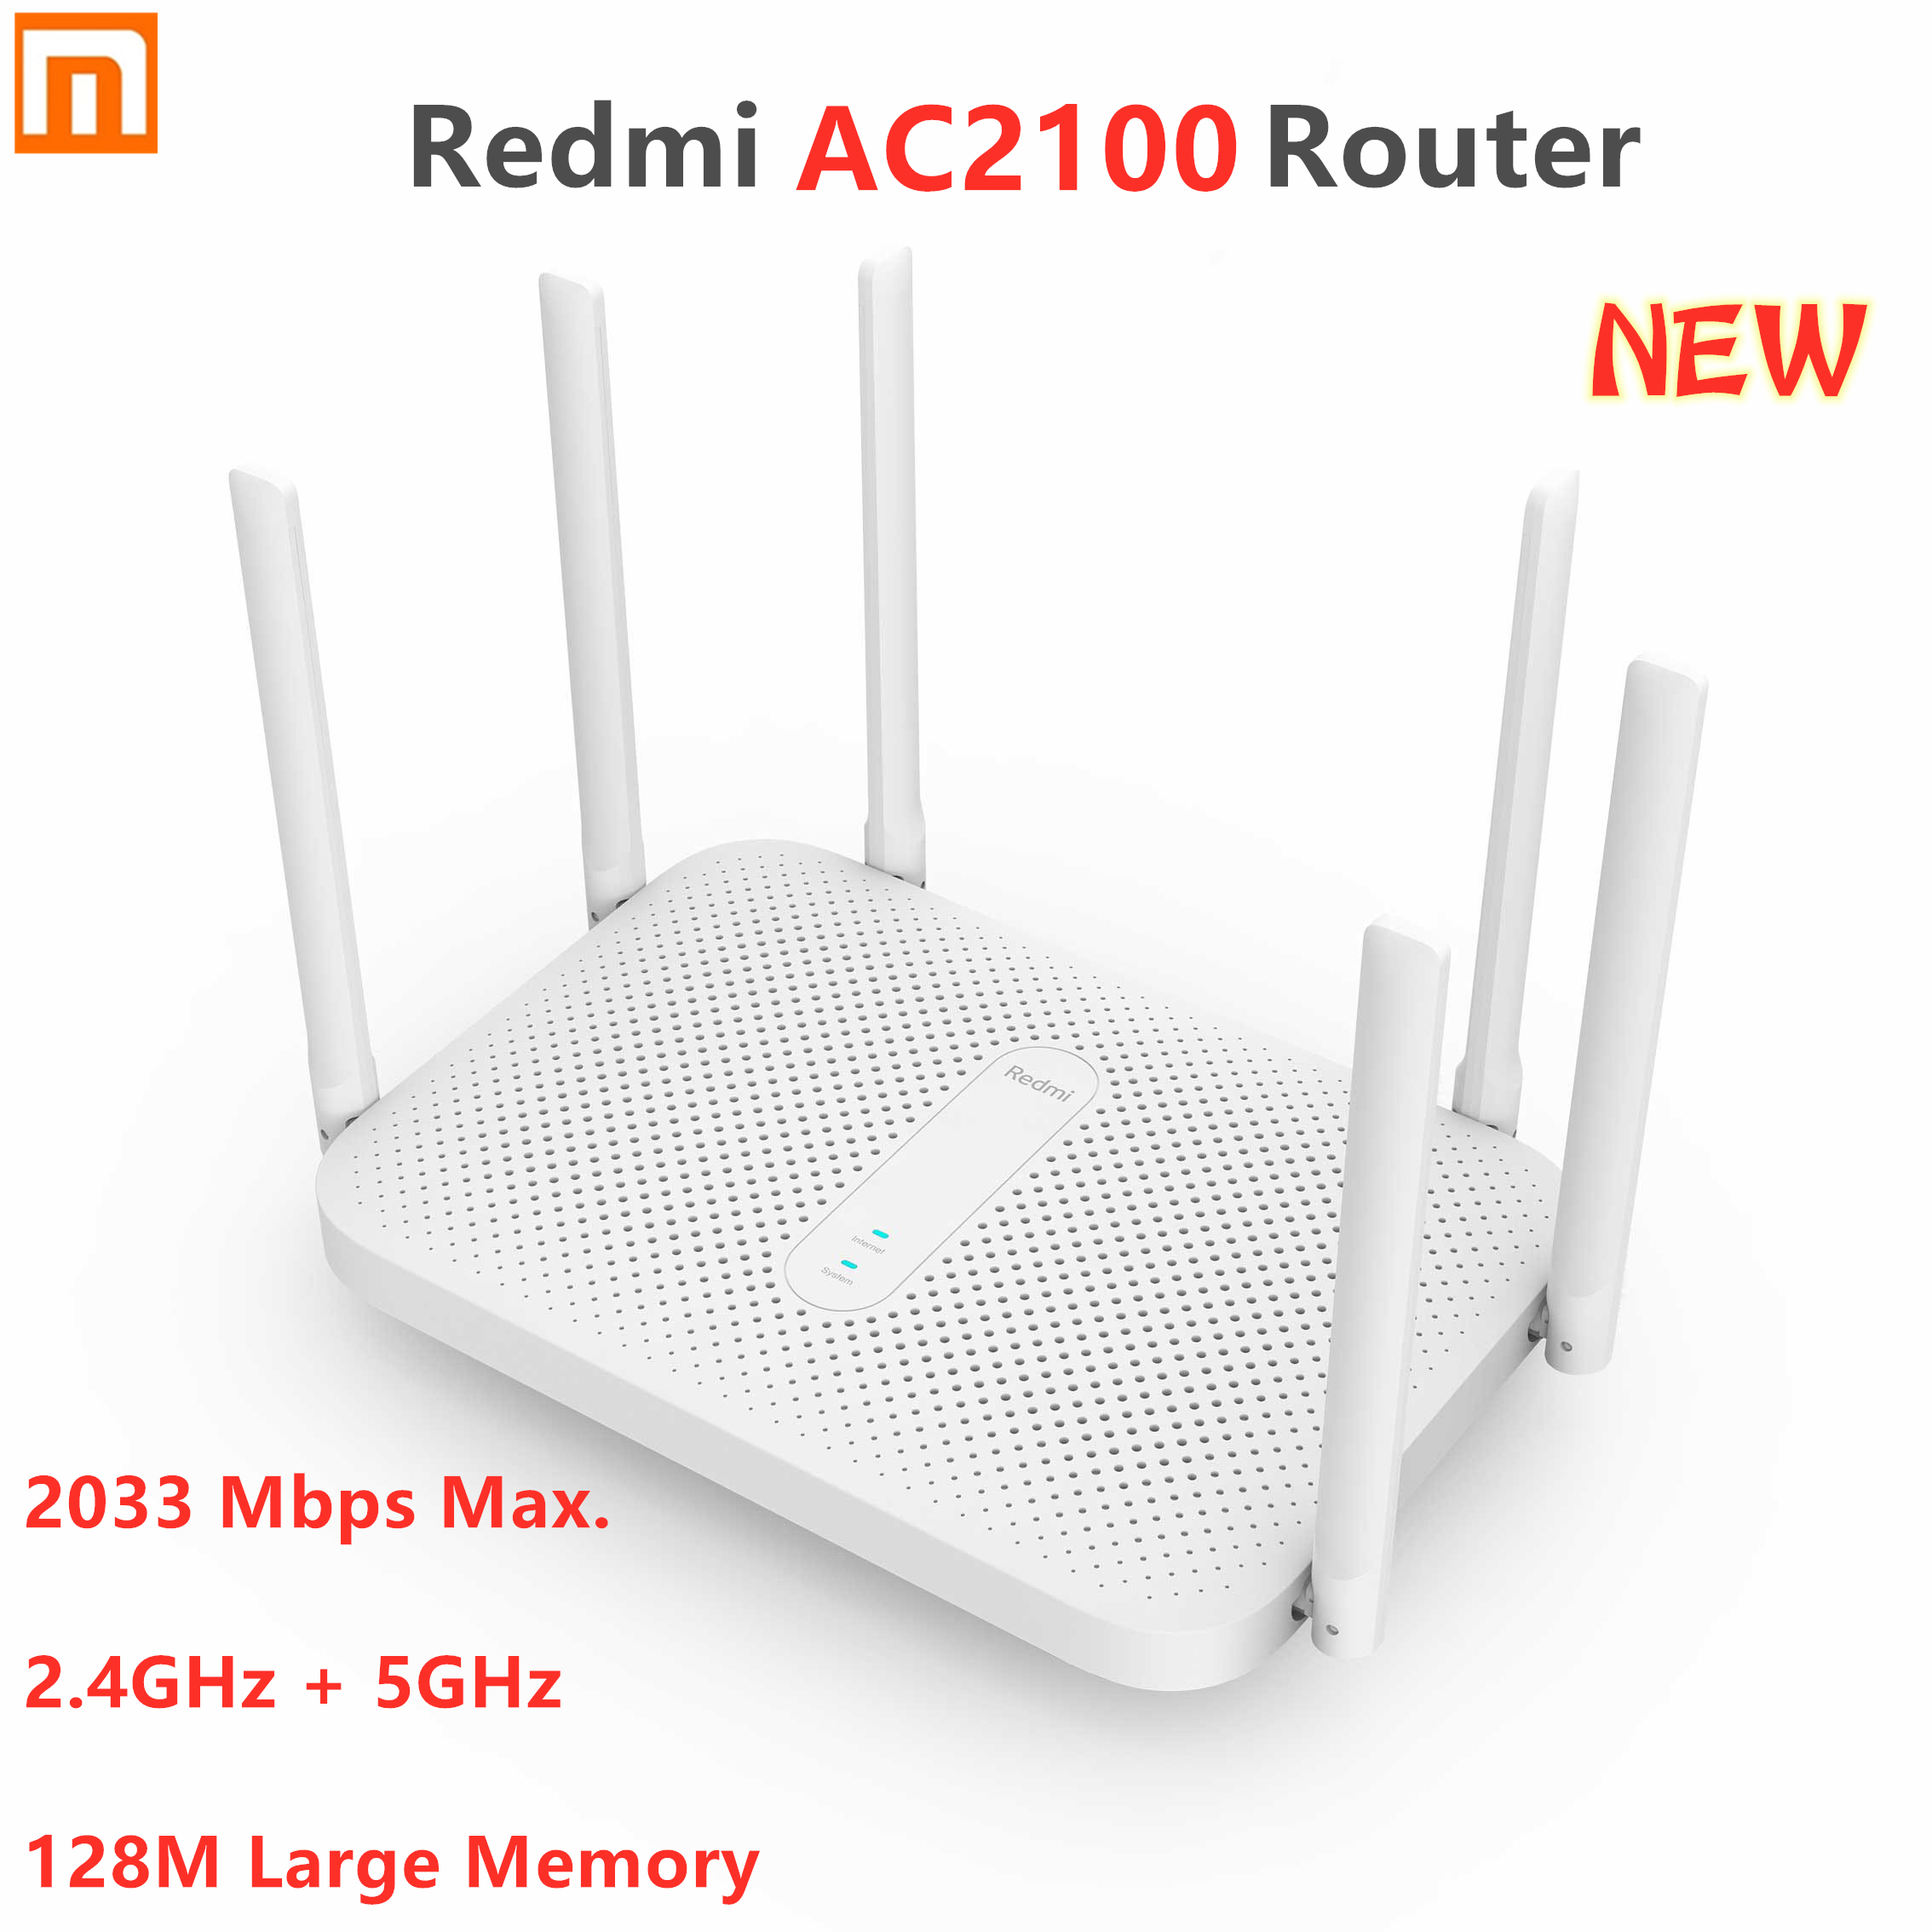 Original Xiaomi Redmi AC2100 Router Gigabit 2.4G 5.0GHz Dual-Band 2033Mbps Wireless Router Wifi Repeater 6 High Gain Antennas